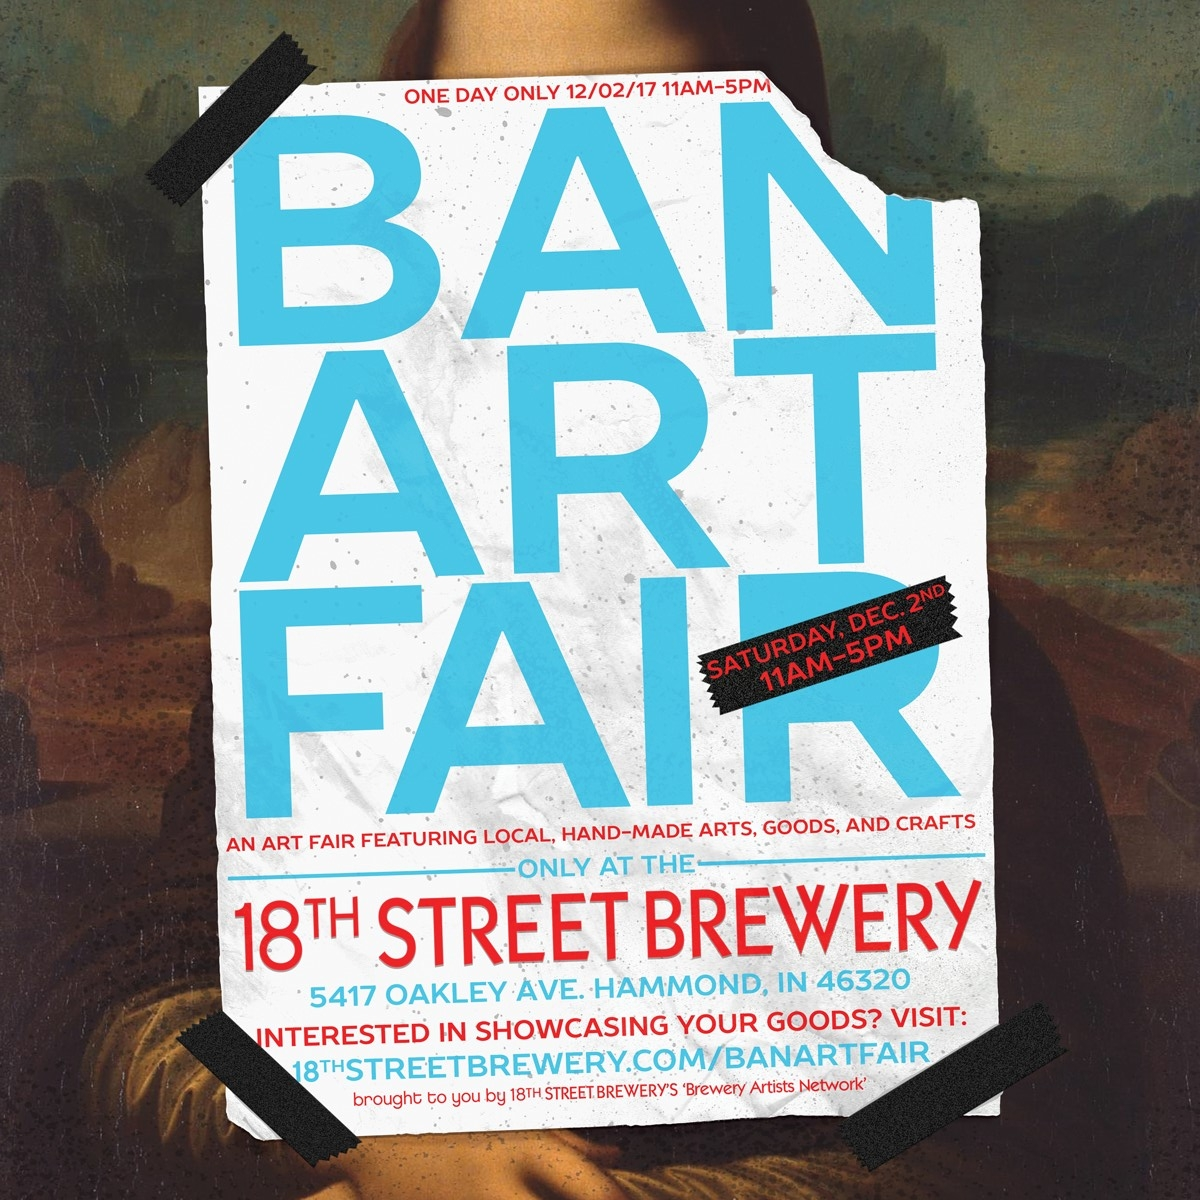 18th-Street-Brewery-BanArtFair2017_IG.jpg